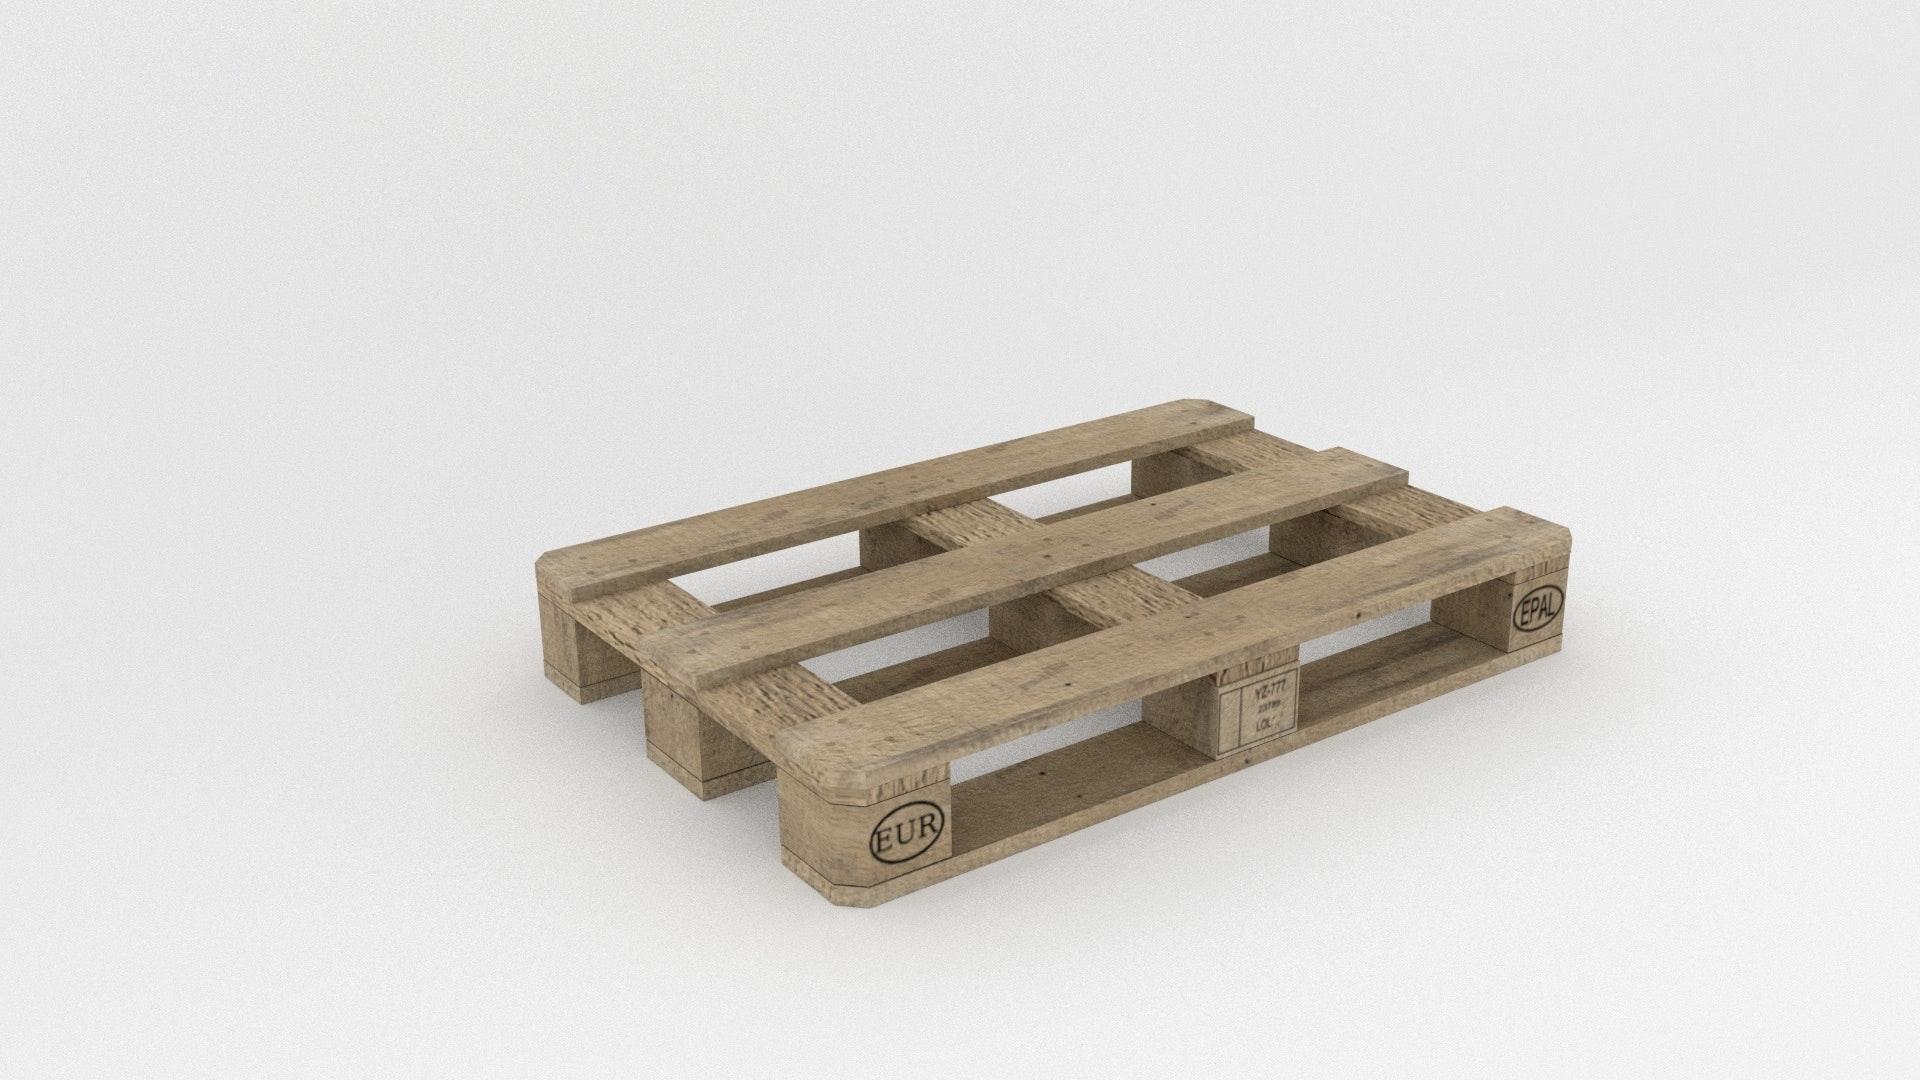 pallet-wood-wooden-210032.jpg